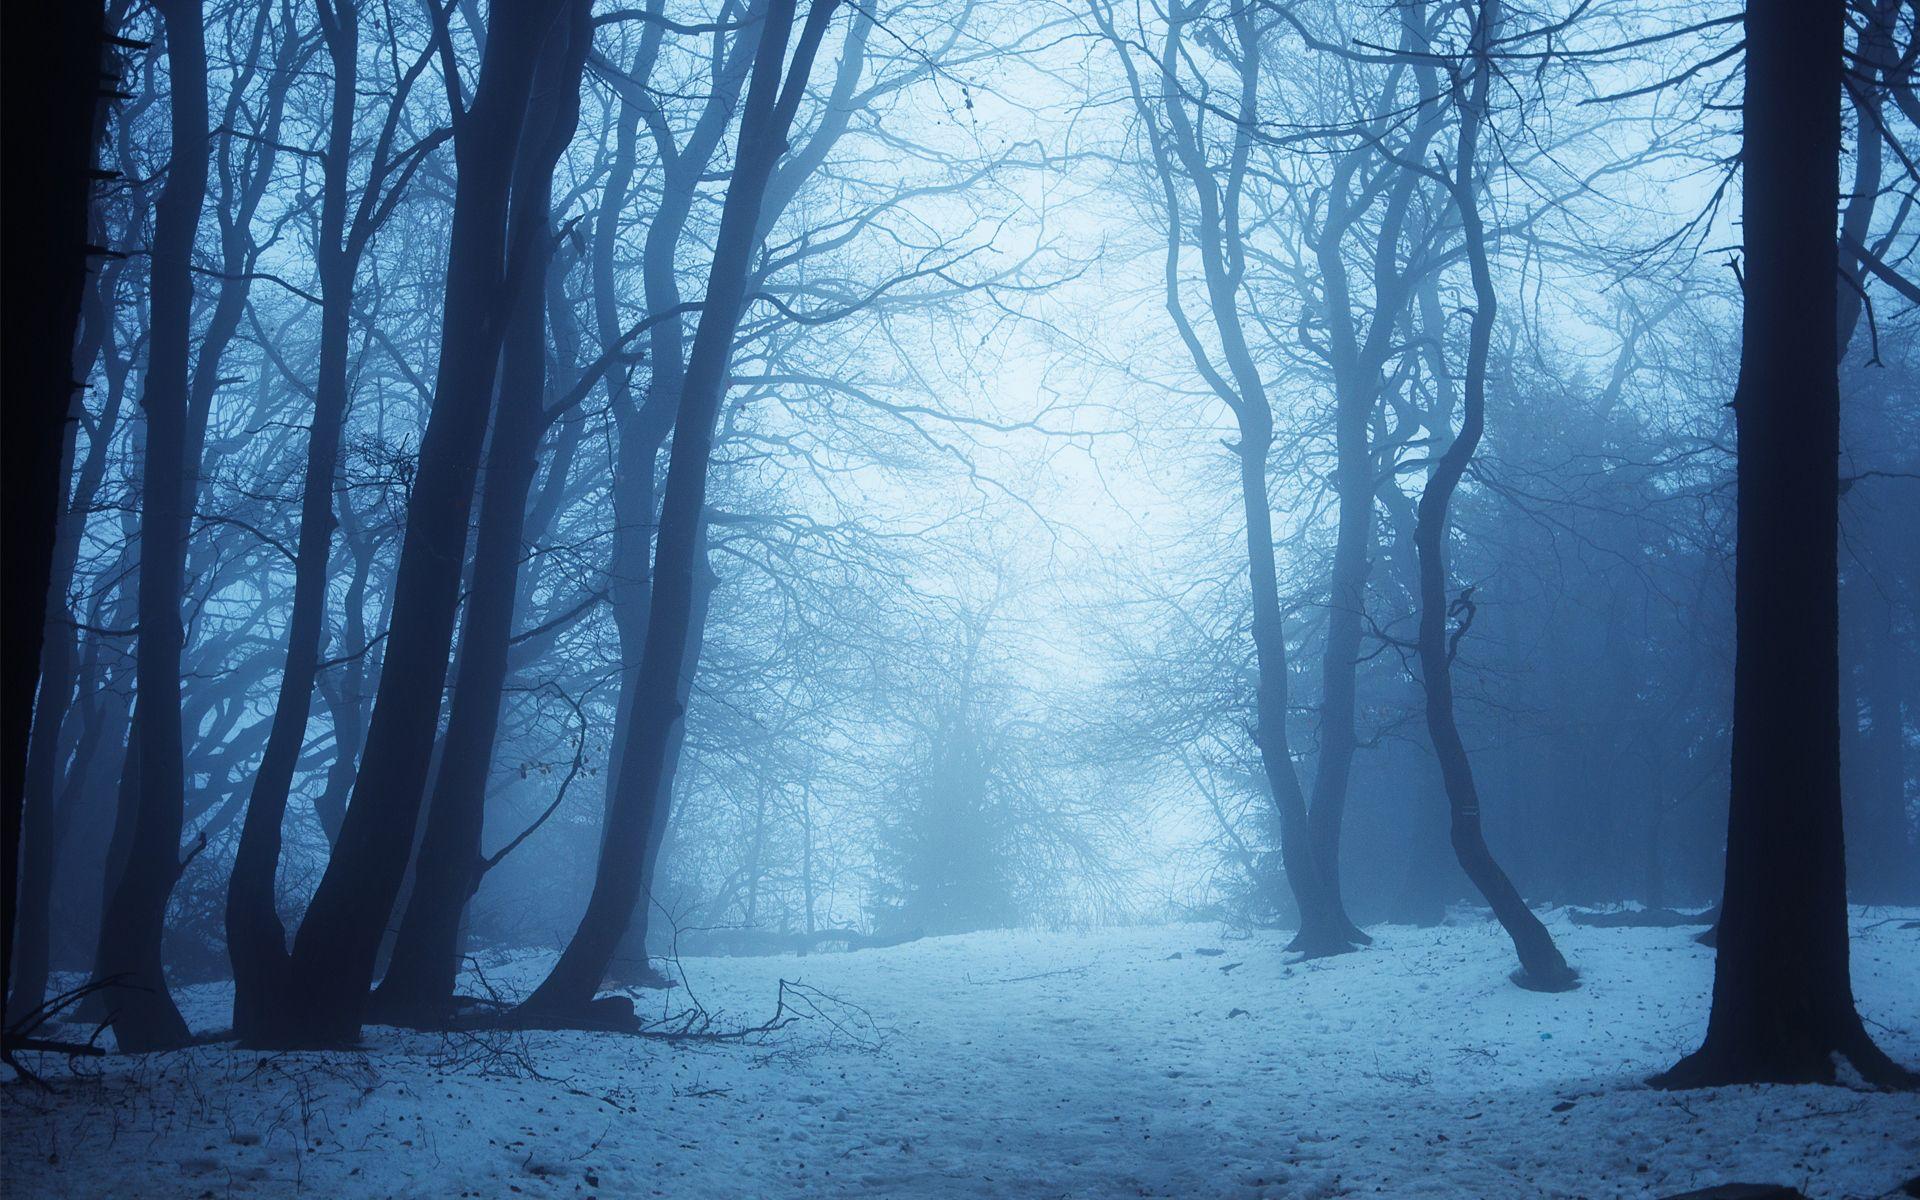 Winter Forest Bing